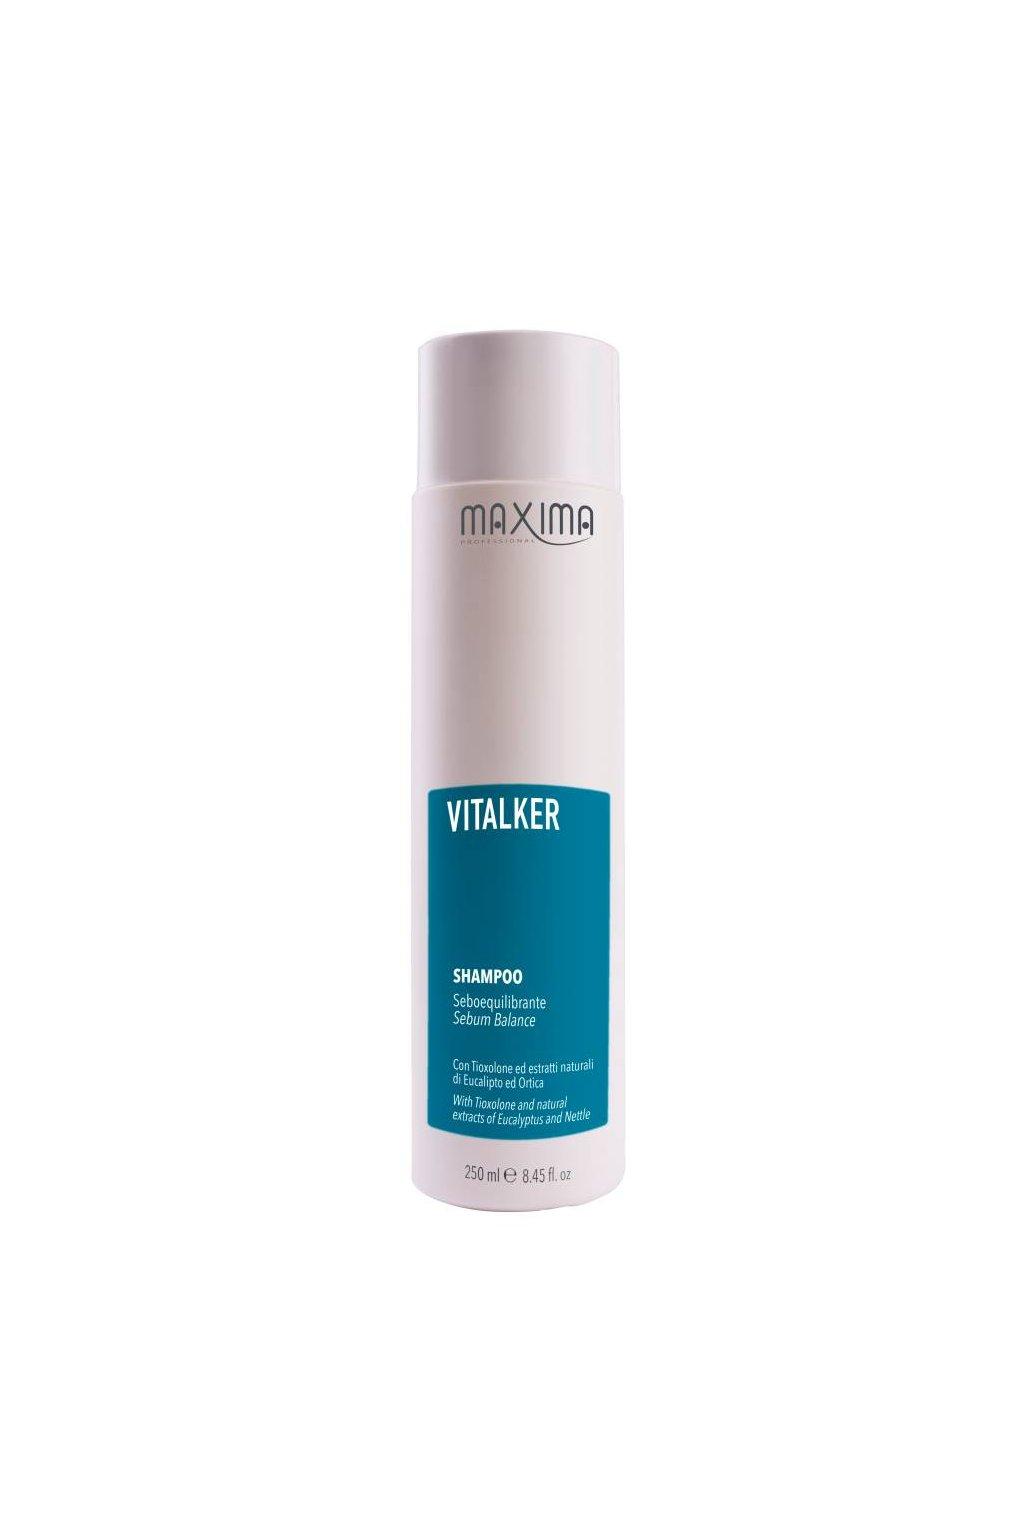 Maxima VITALKER Šampon pro mastnou pokožku s eukalyptem 250ml